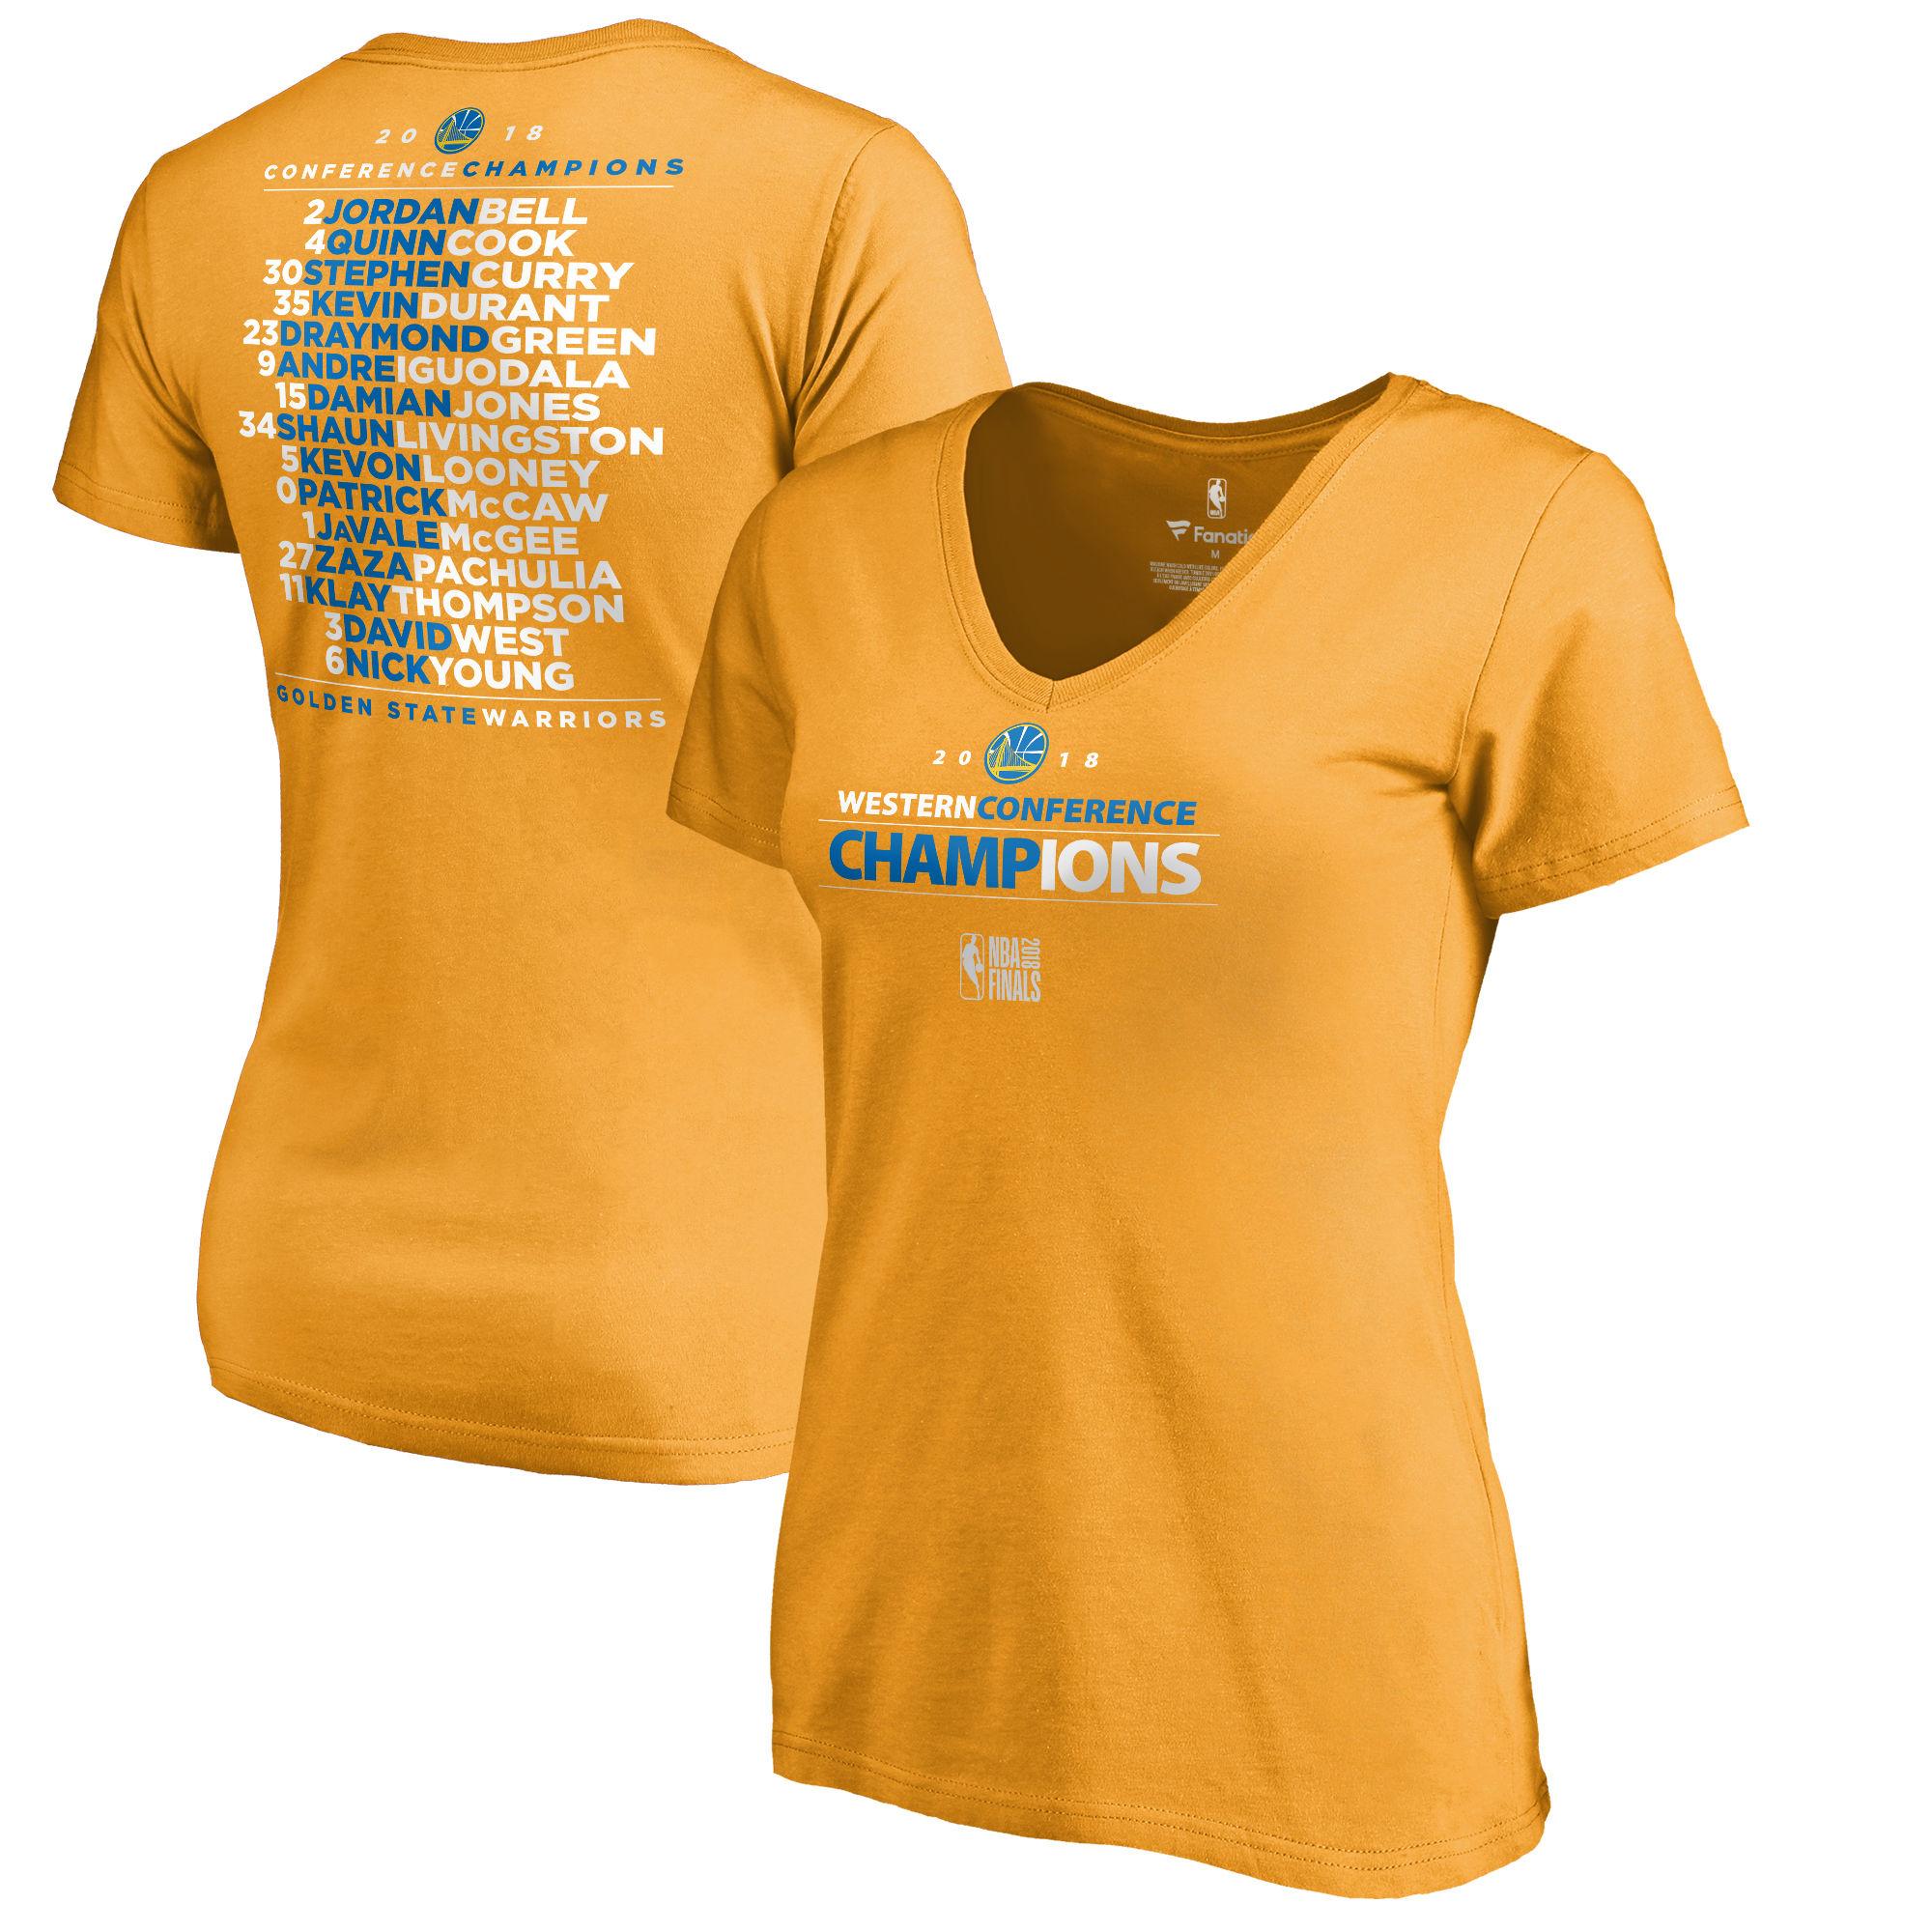 Golden State Warriors Fanatics Branded Women's 2018 Western Conference Champions Backcourt Blacktop T-Shirt Gold